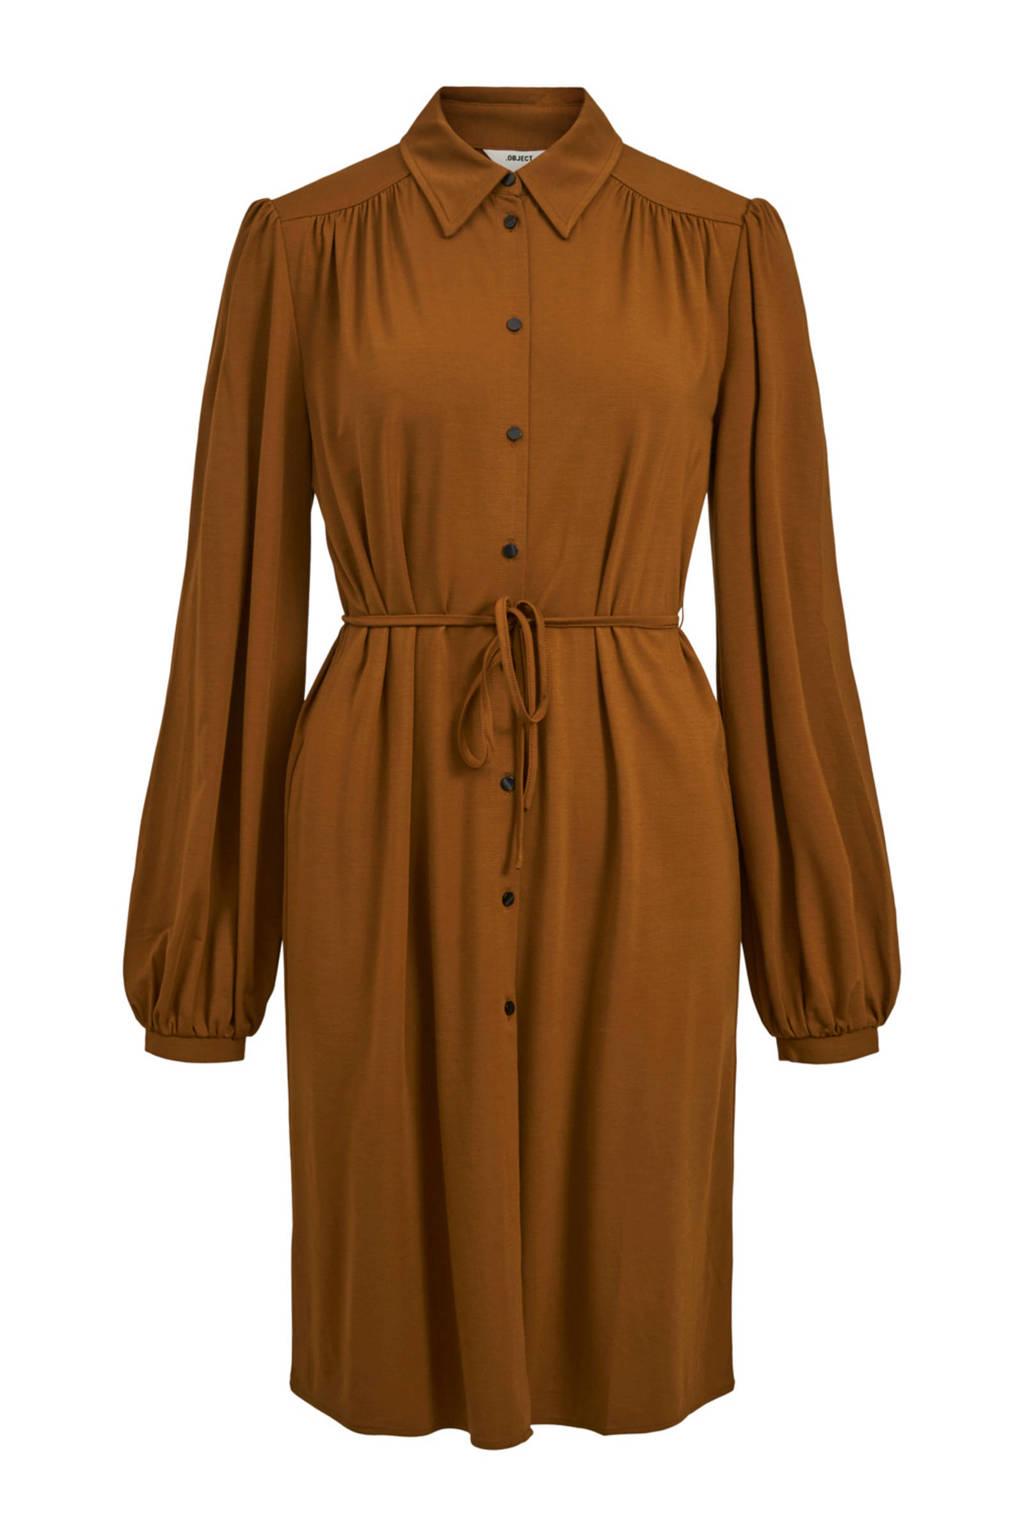 OBJECT blousejurk Lay met ceintuur bruin, Bruin